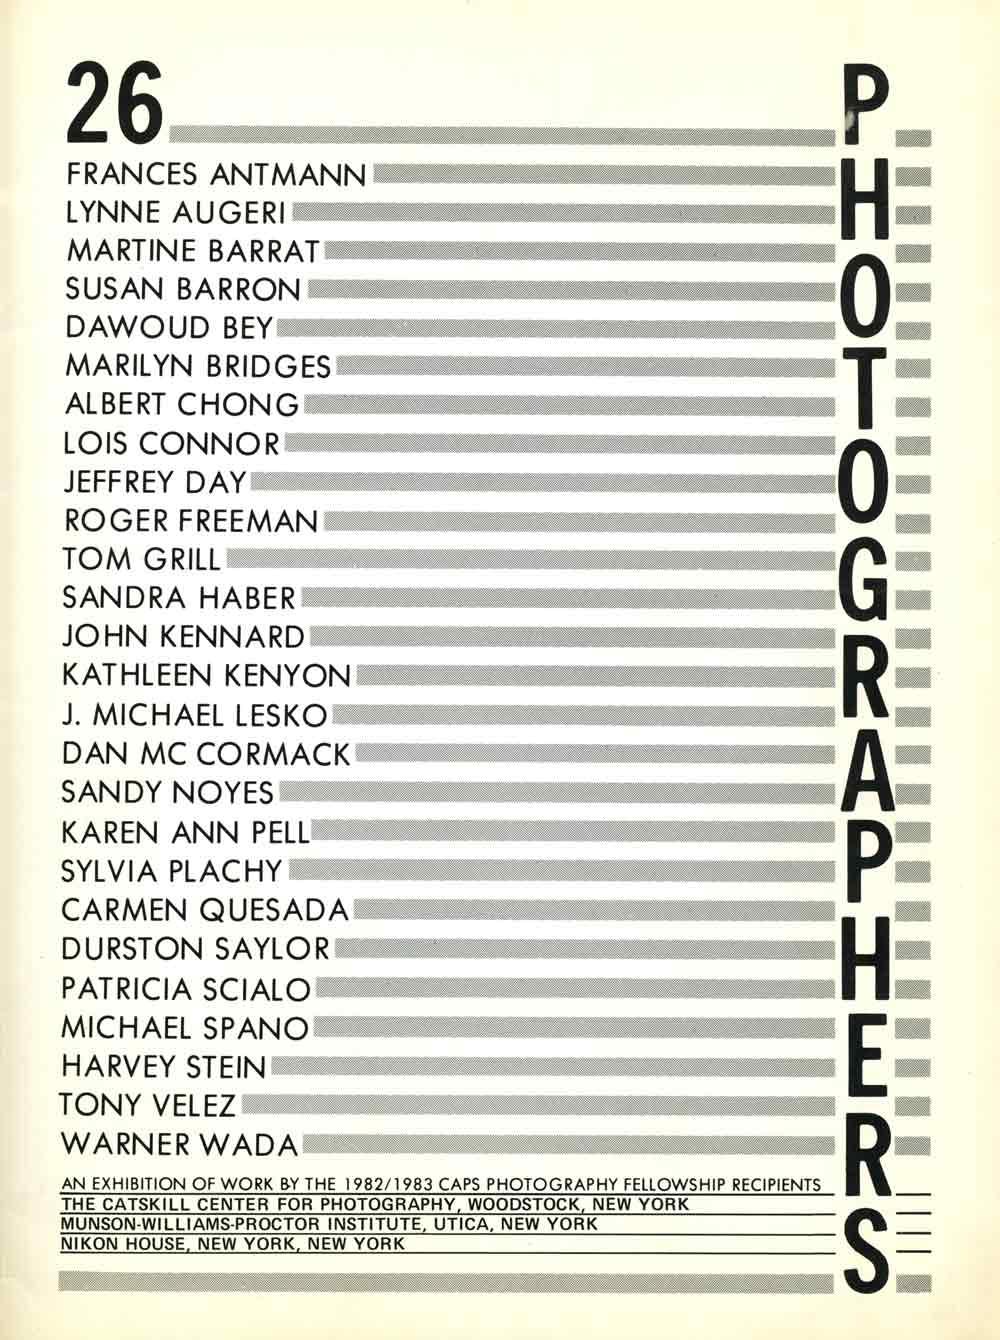 26 Photographers, pg 1